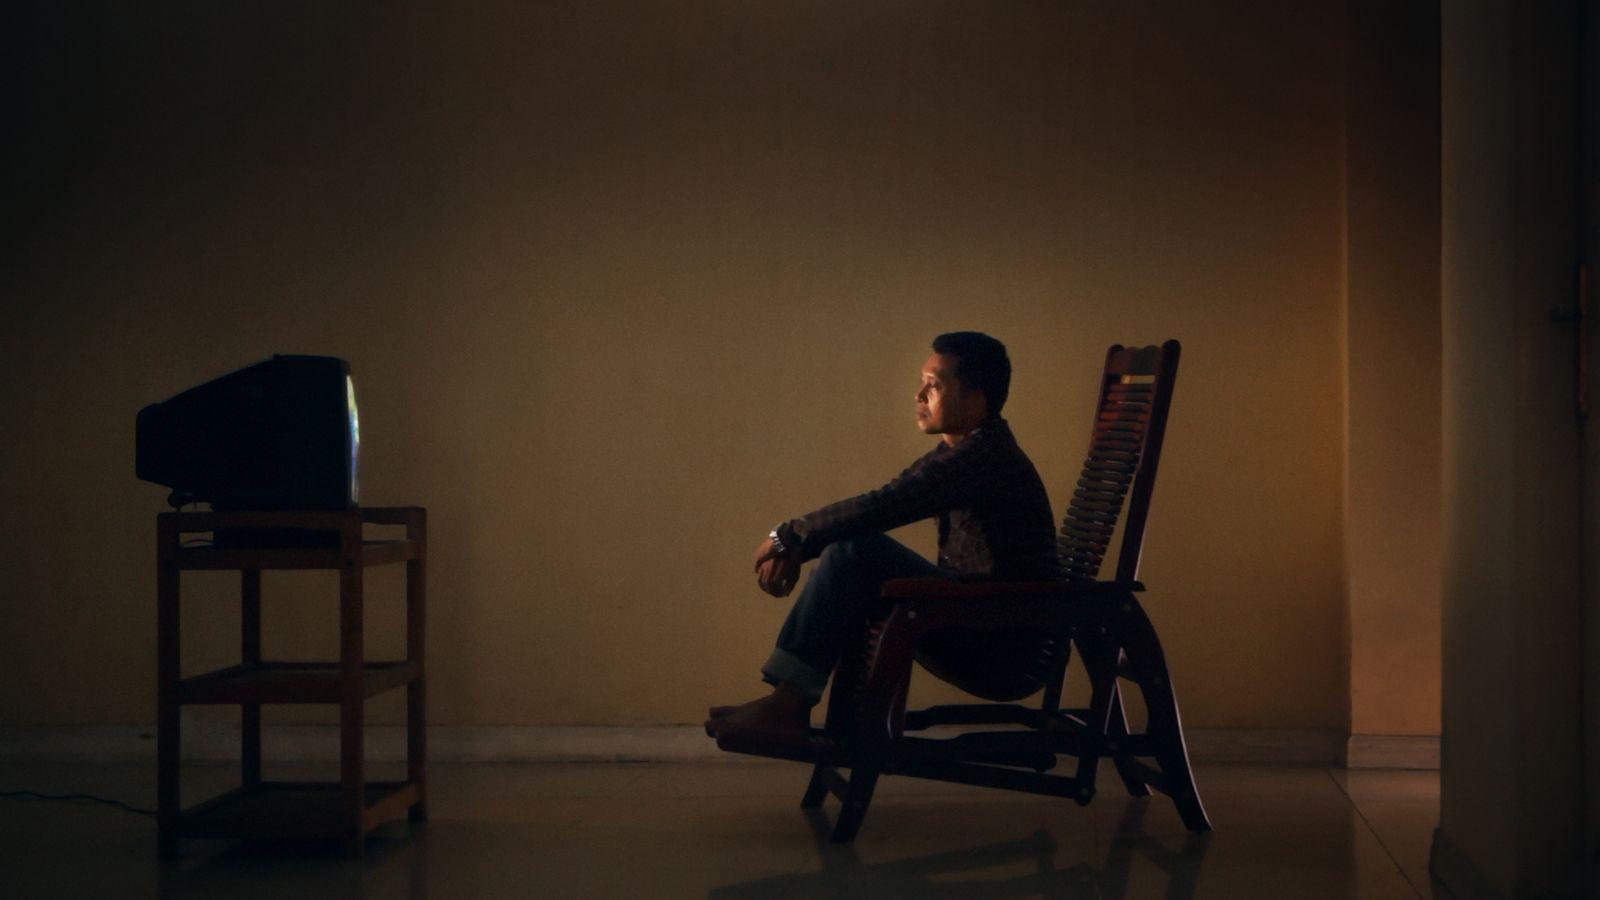 EINMALIGE VERWENDUNG Kino/ The Look of Silence